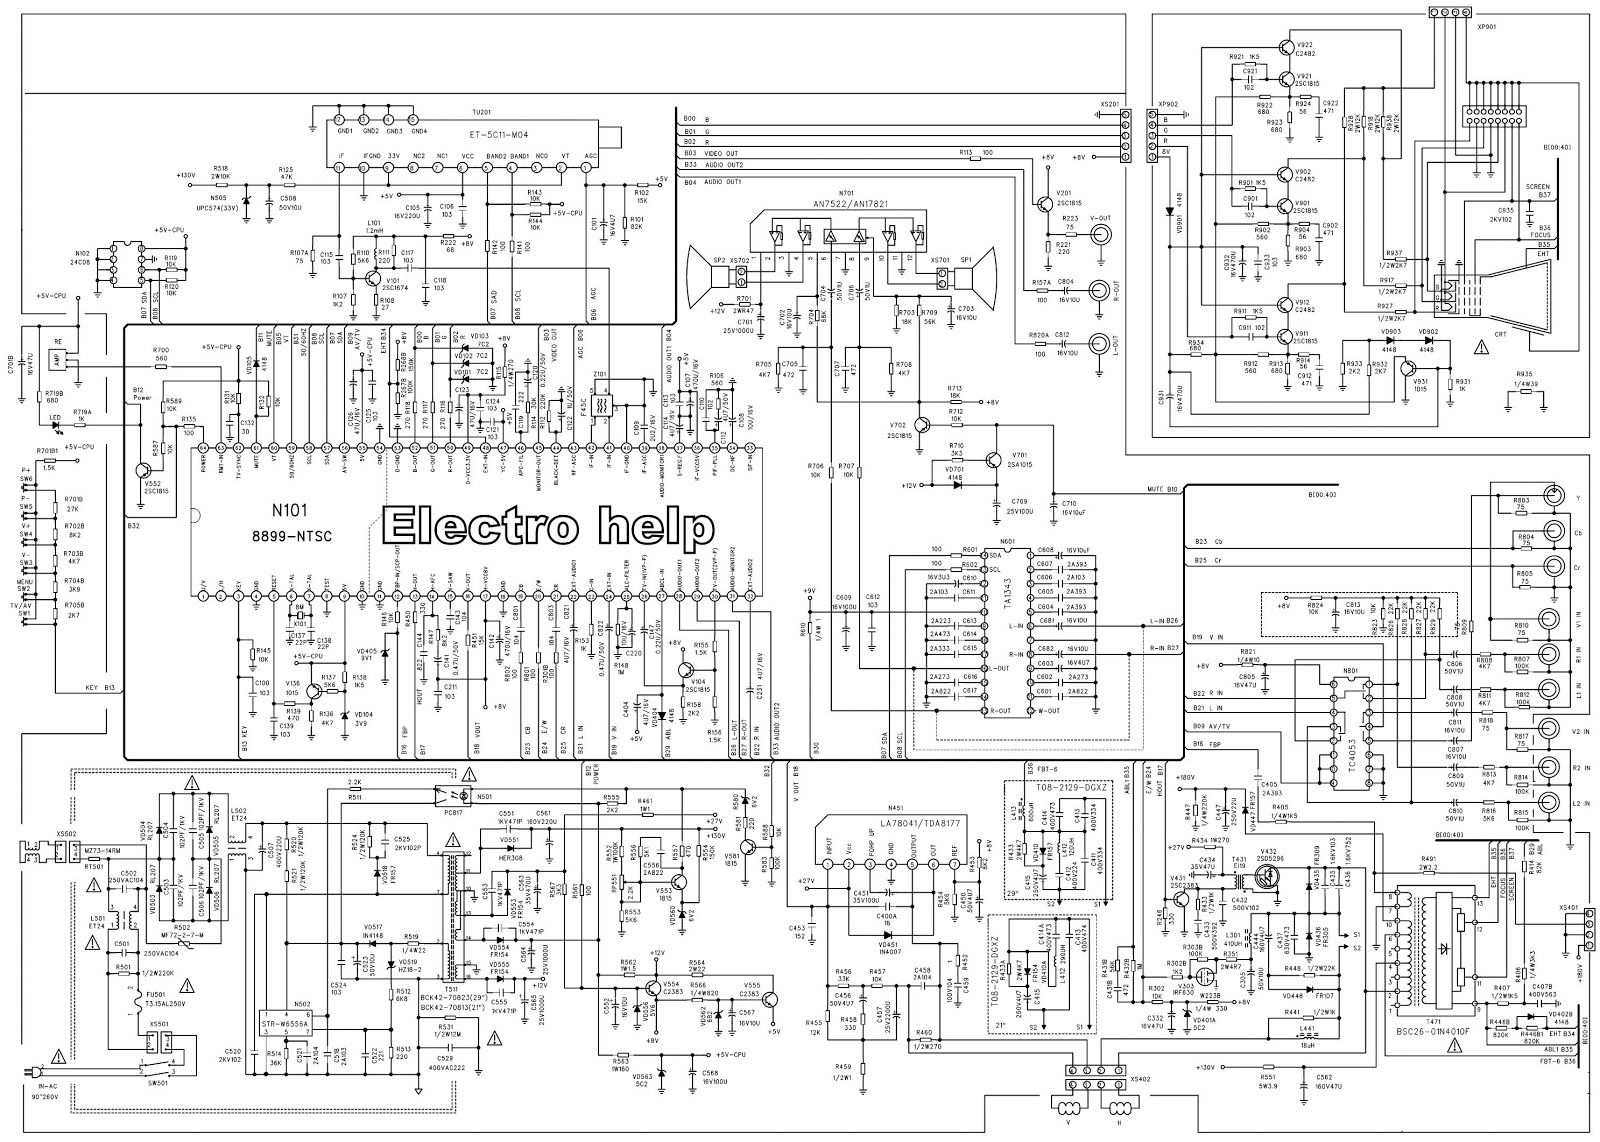 hight resolution of sansui tv circuit diagram free download circuit diagram imagessansui tv circuit diagram free download circuit diagram